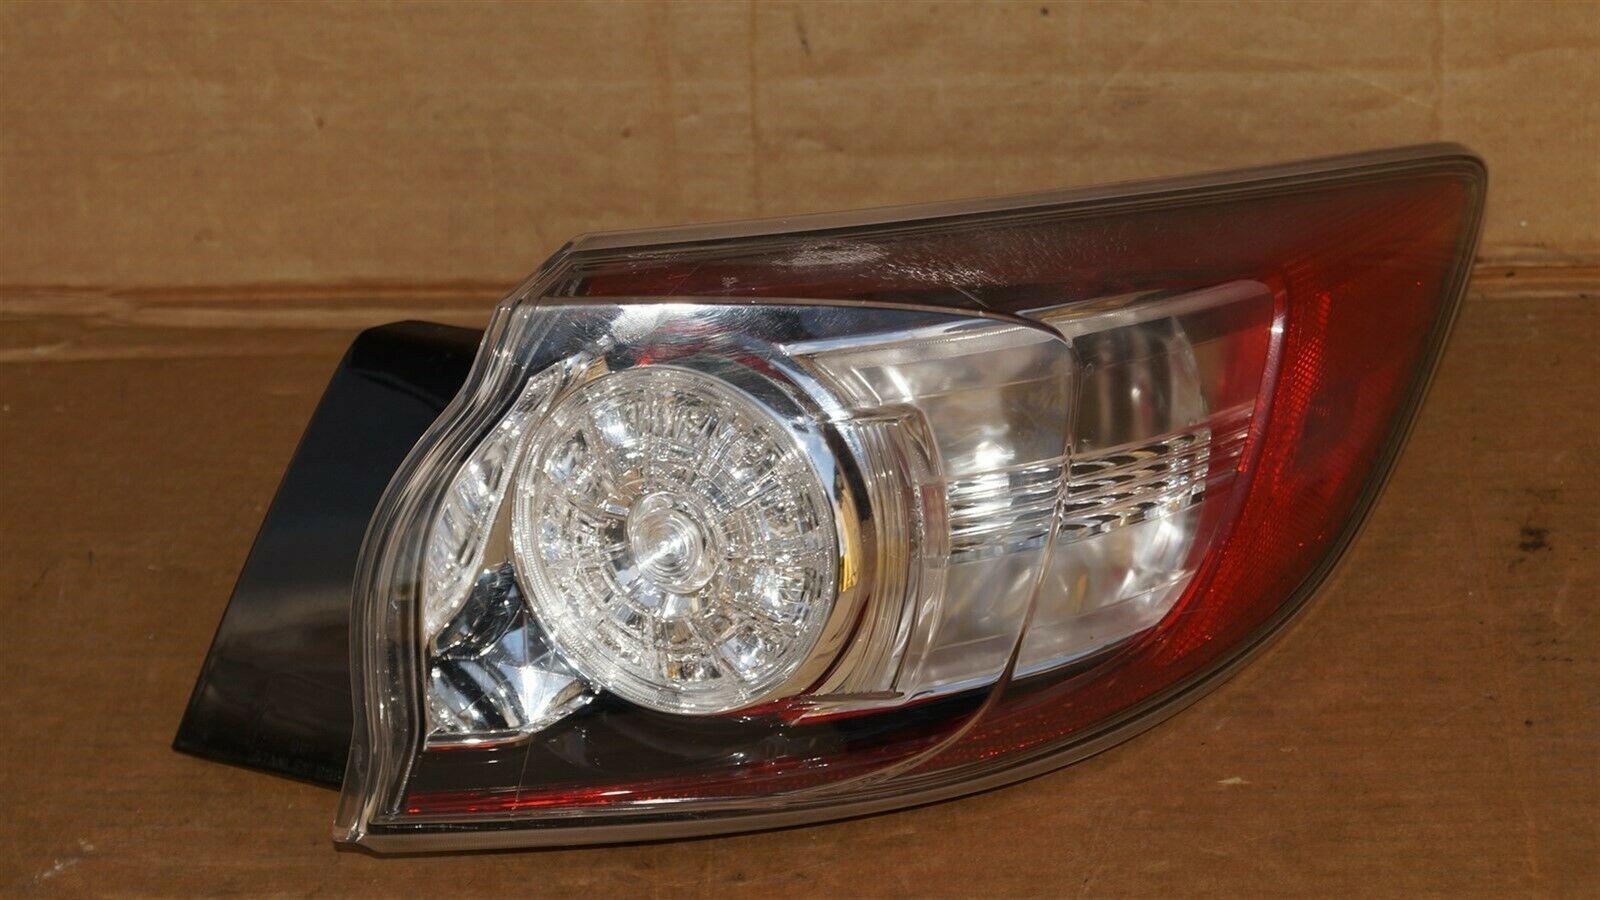 10-13 Mazda3 Mazda 3 Hatchback LED Outer Tail Light Taillight Passenger Right RH